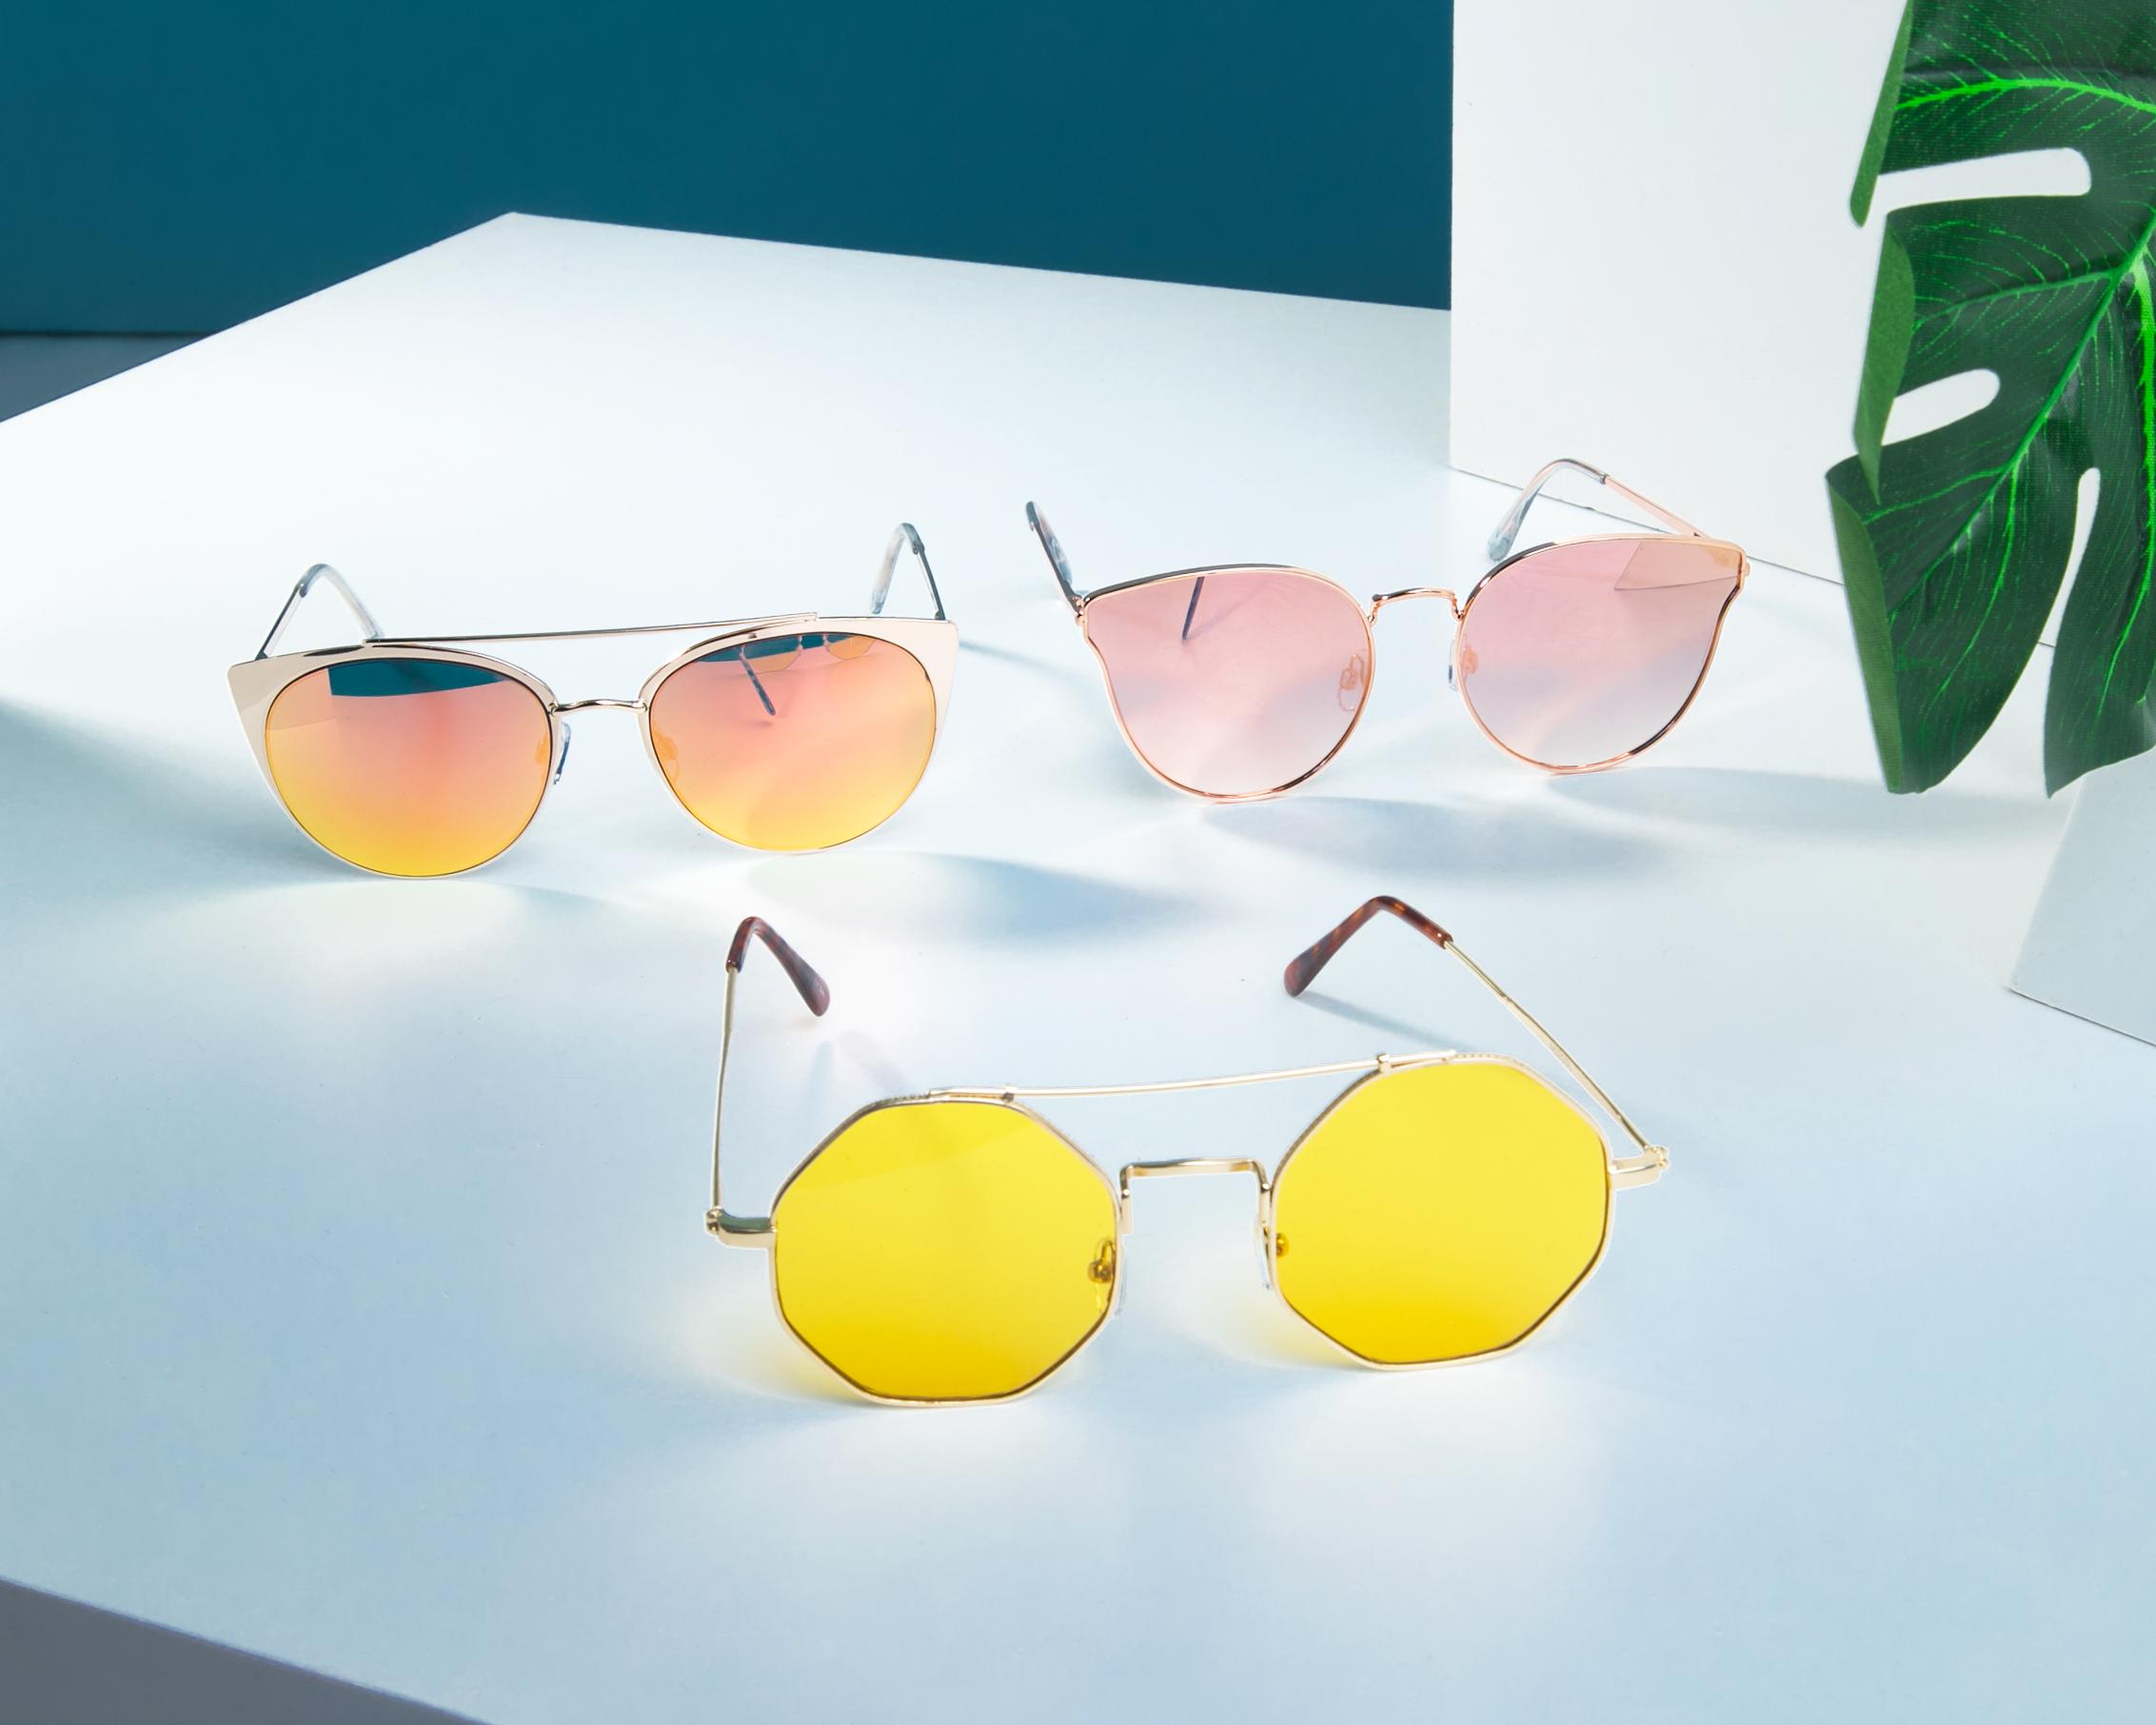 sunglasses_2.jpg